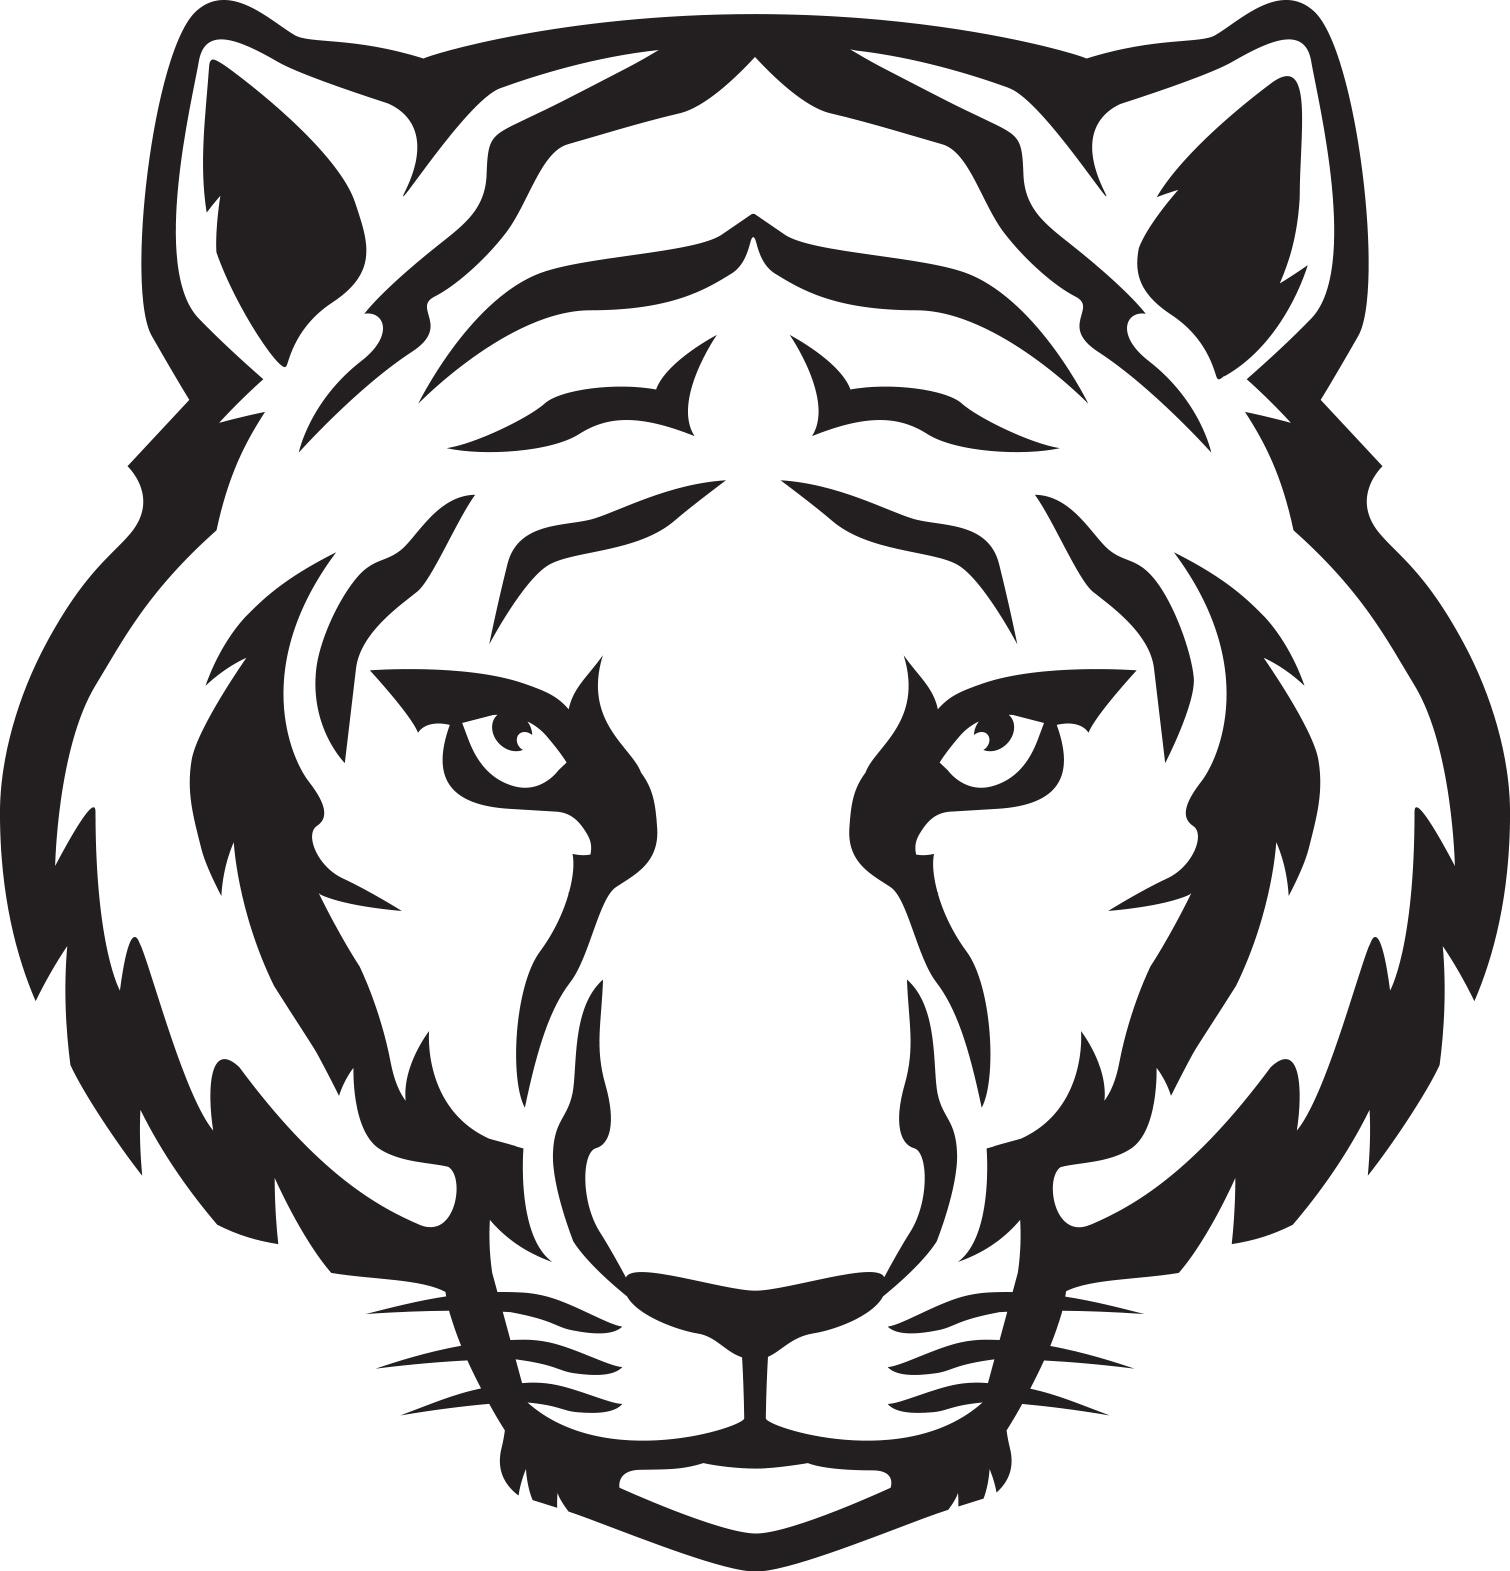 file tiger cartoon face jpg wikipedia rh en m wikipedia org cartoon tiger face paint cartoon tiger face images